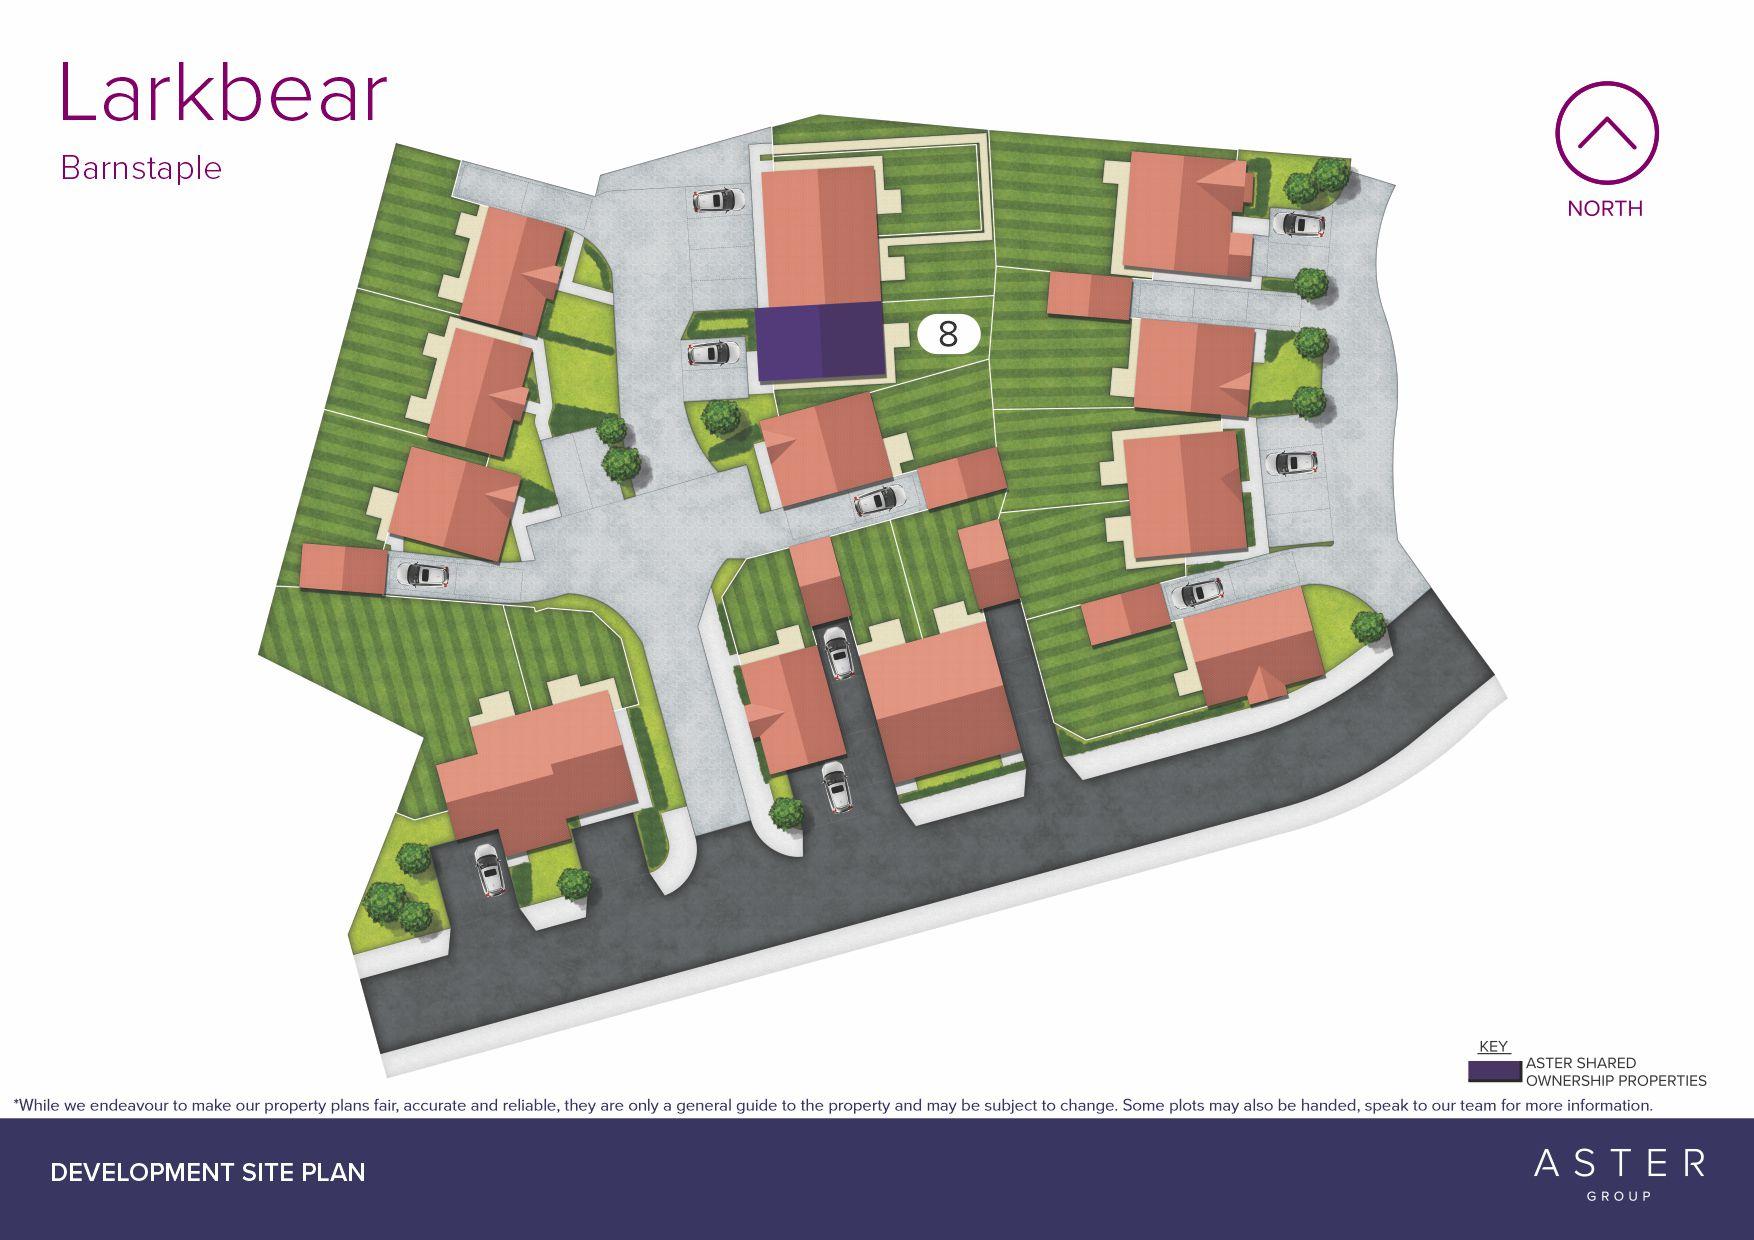 Larkbear site plan